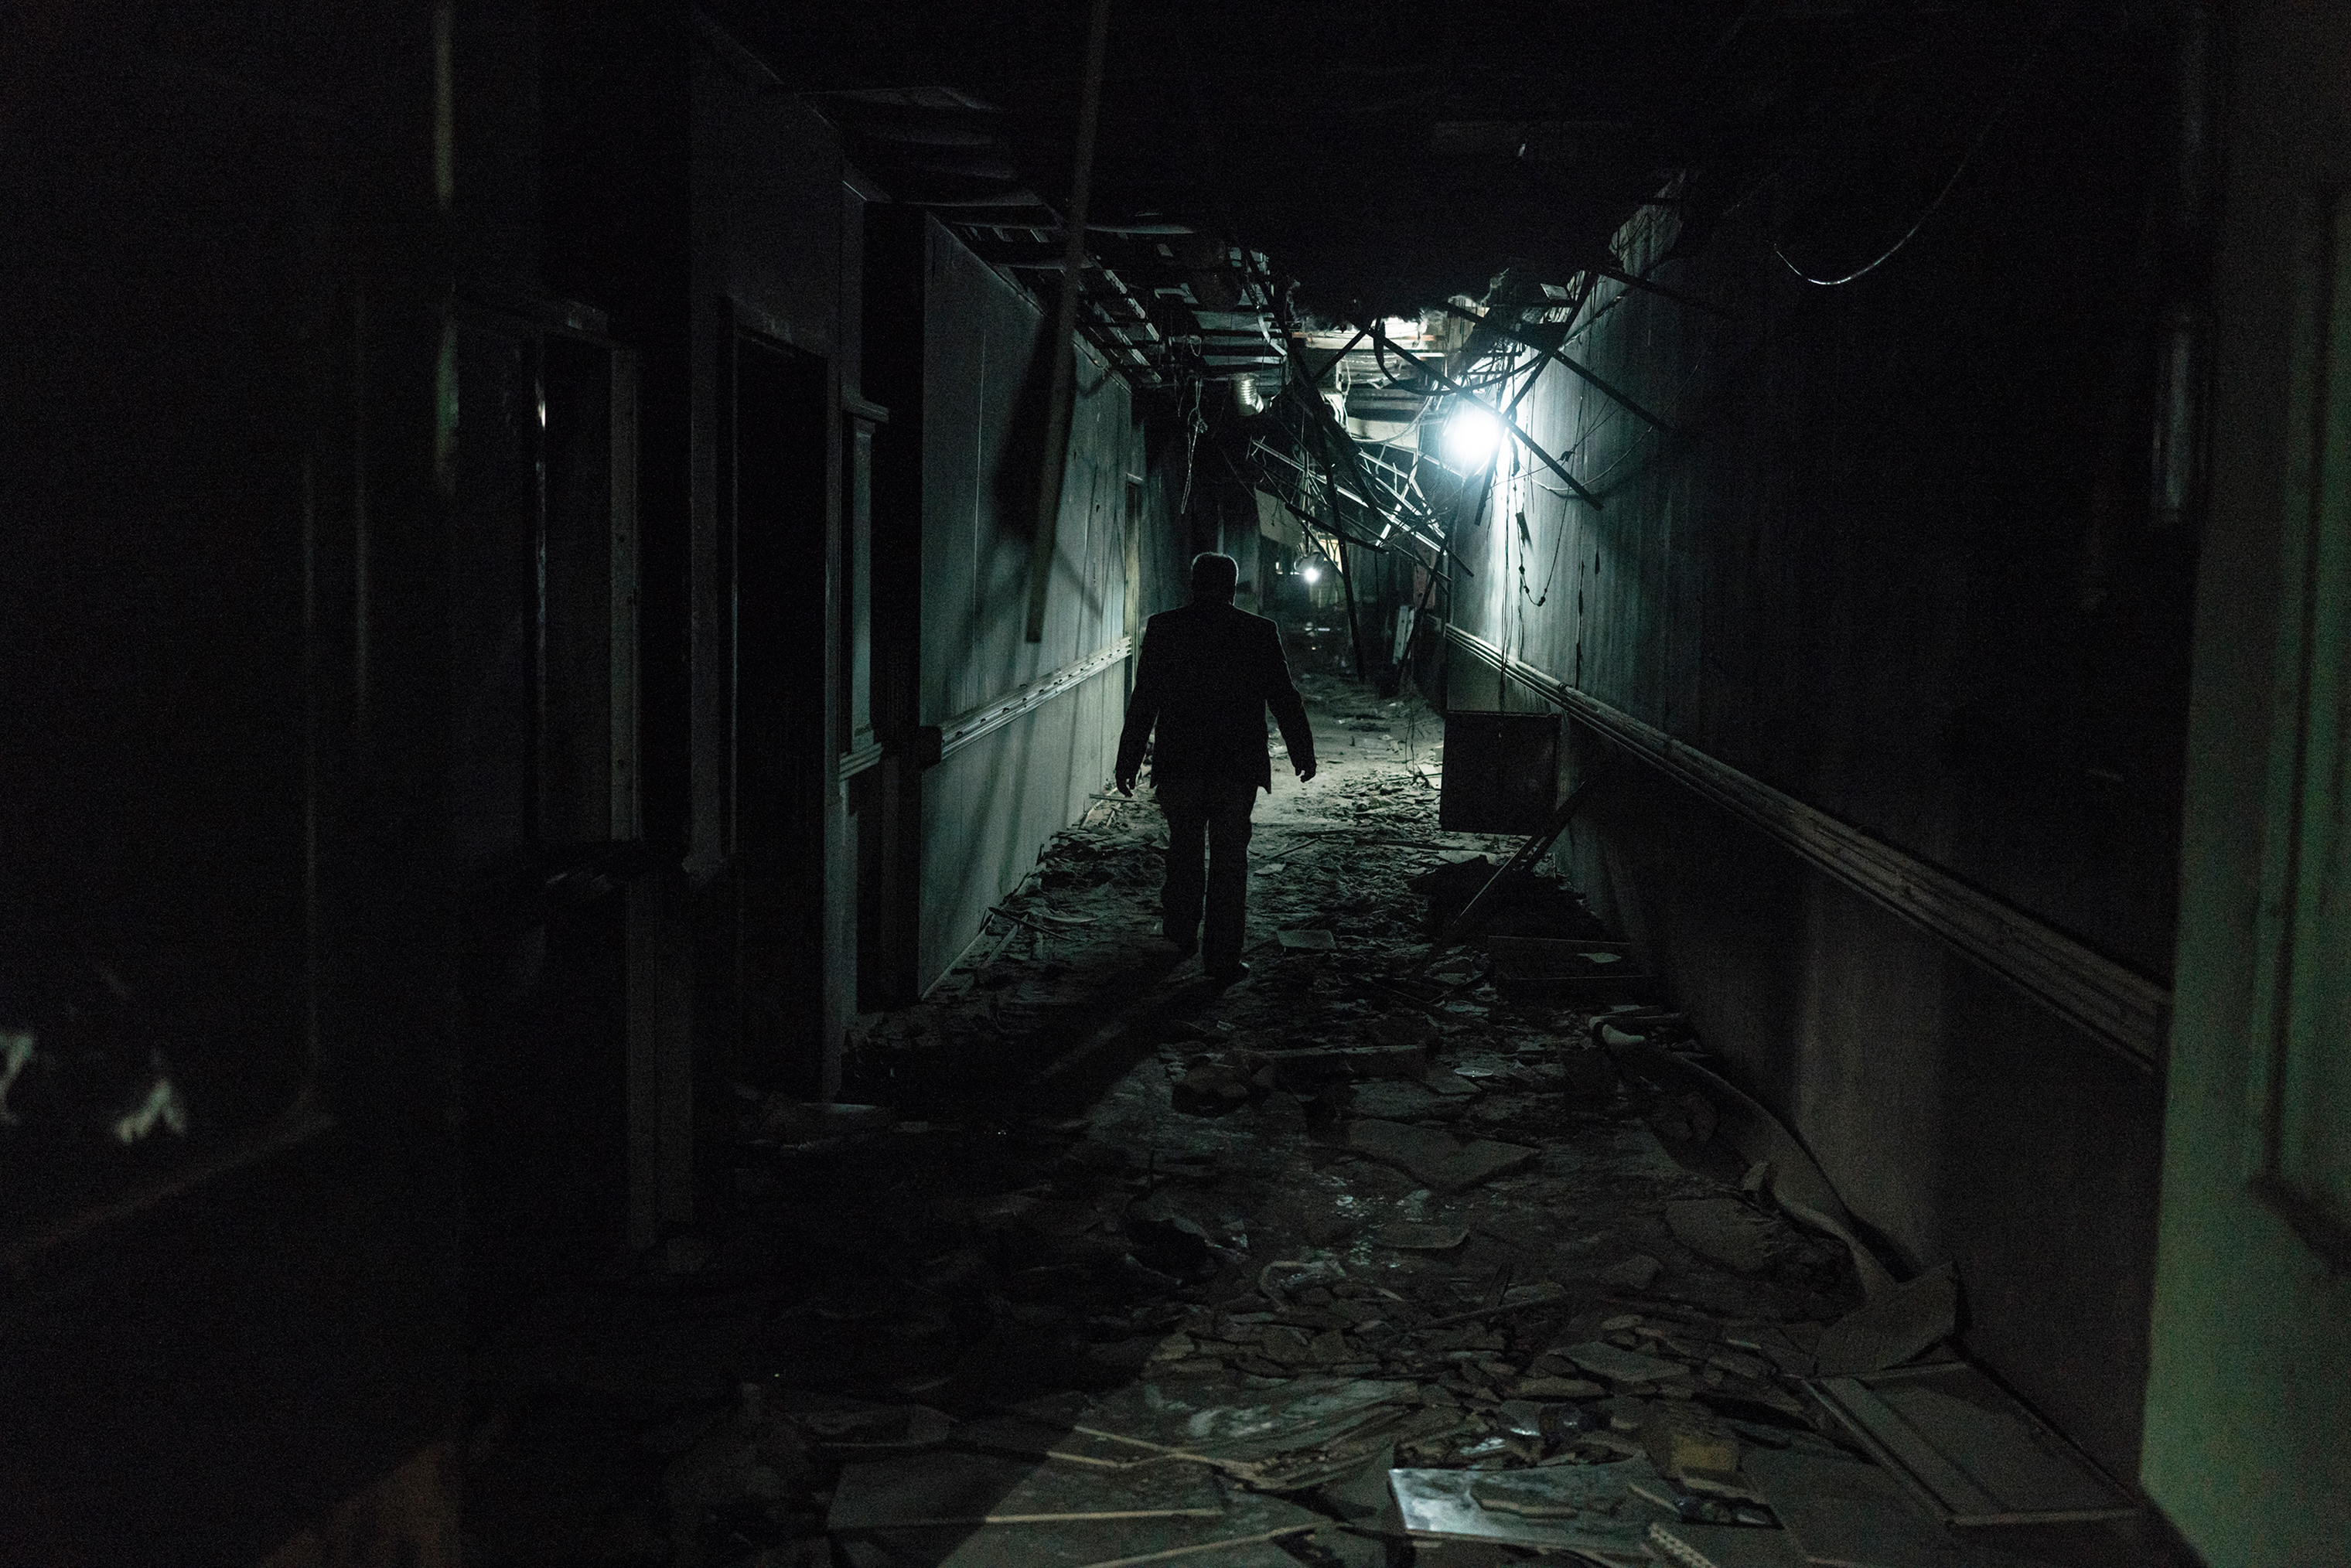 A man walks inside a corridor of the Fallujah Teaching Hospital on Feb. 1.